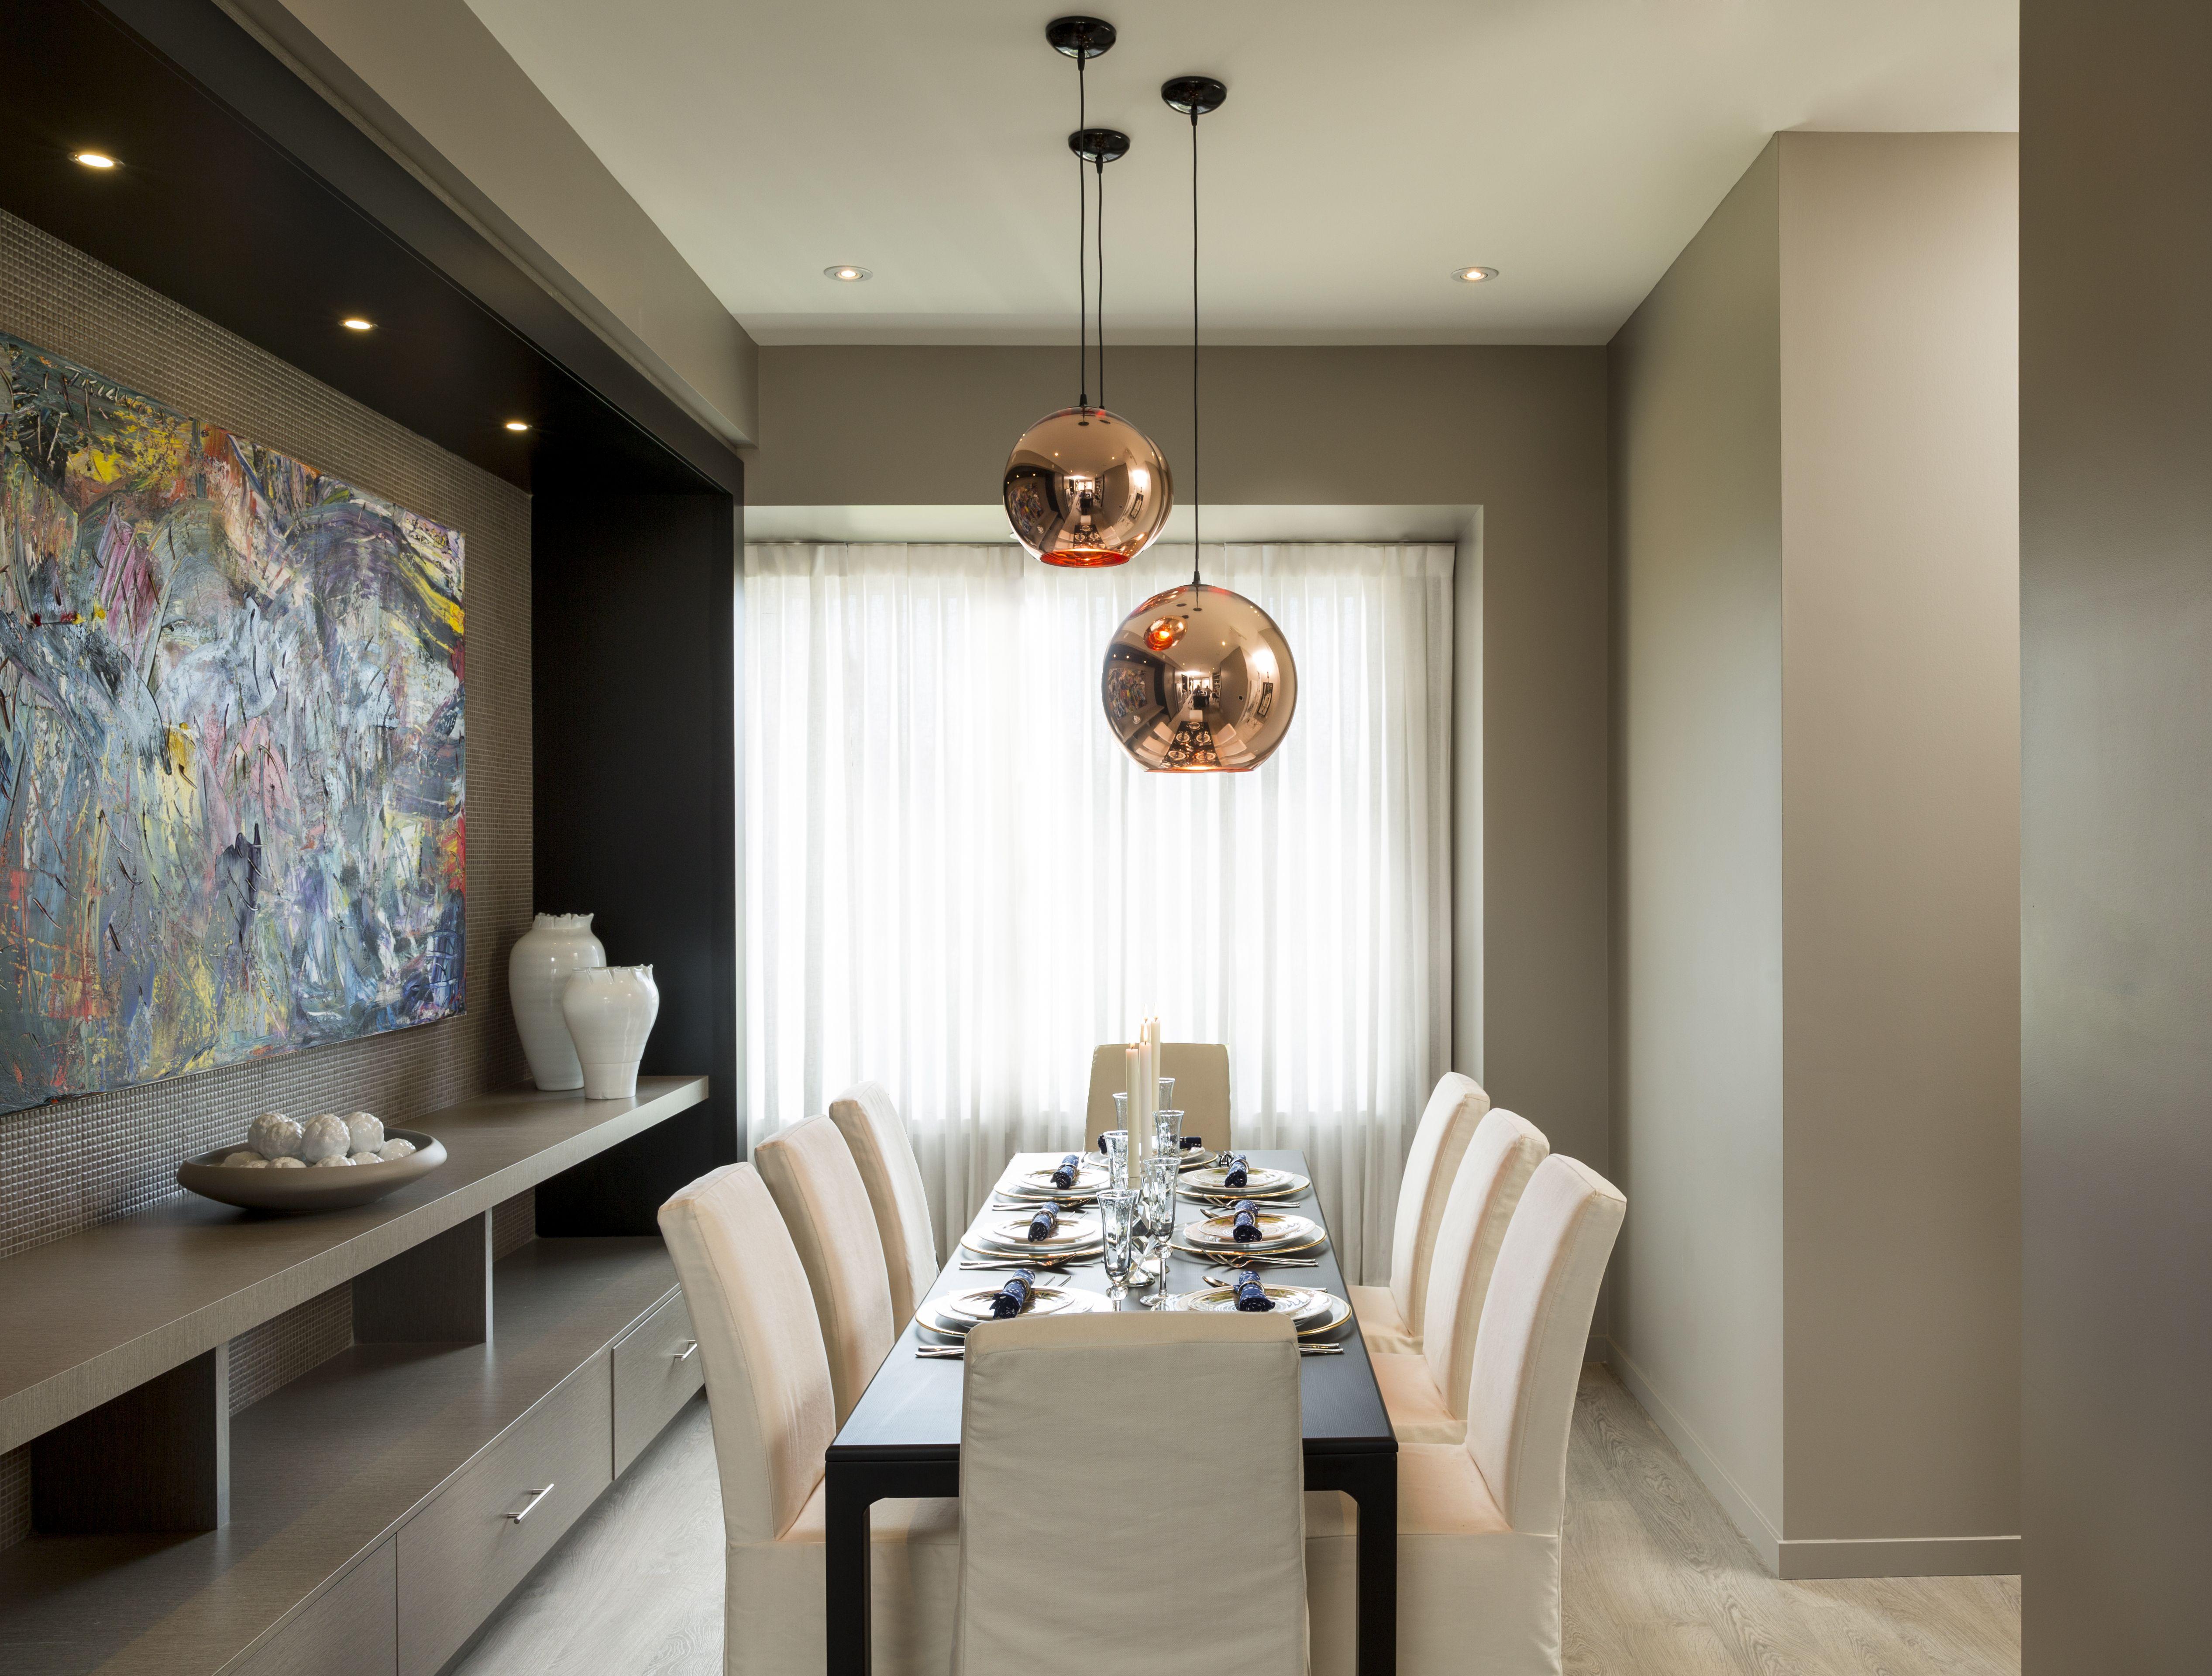 Built In Buffet Table And Modern Light Fixtures To Add A regarding Modern Natural Oak Dining Buffets (Image 5 of 30)